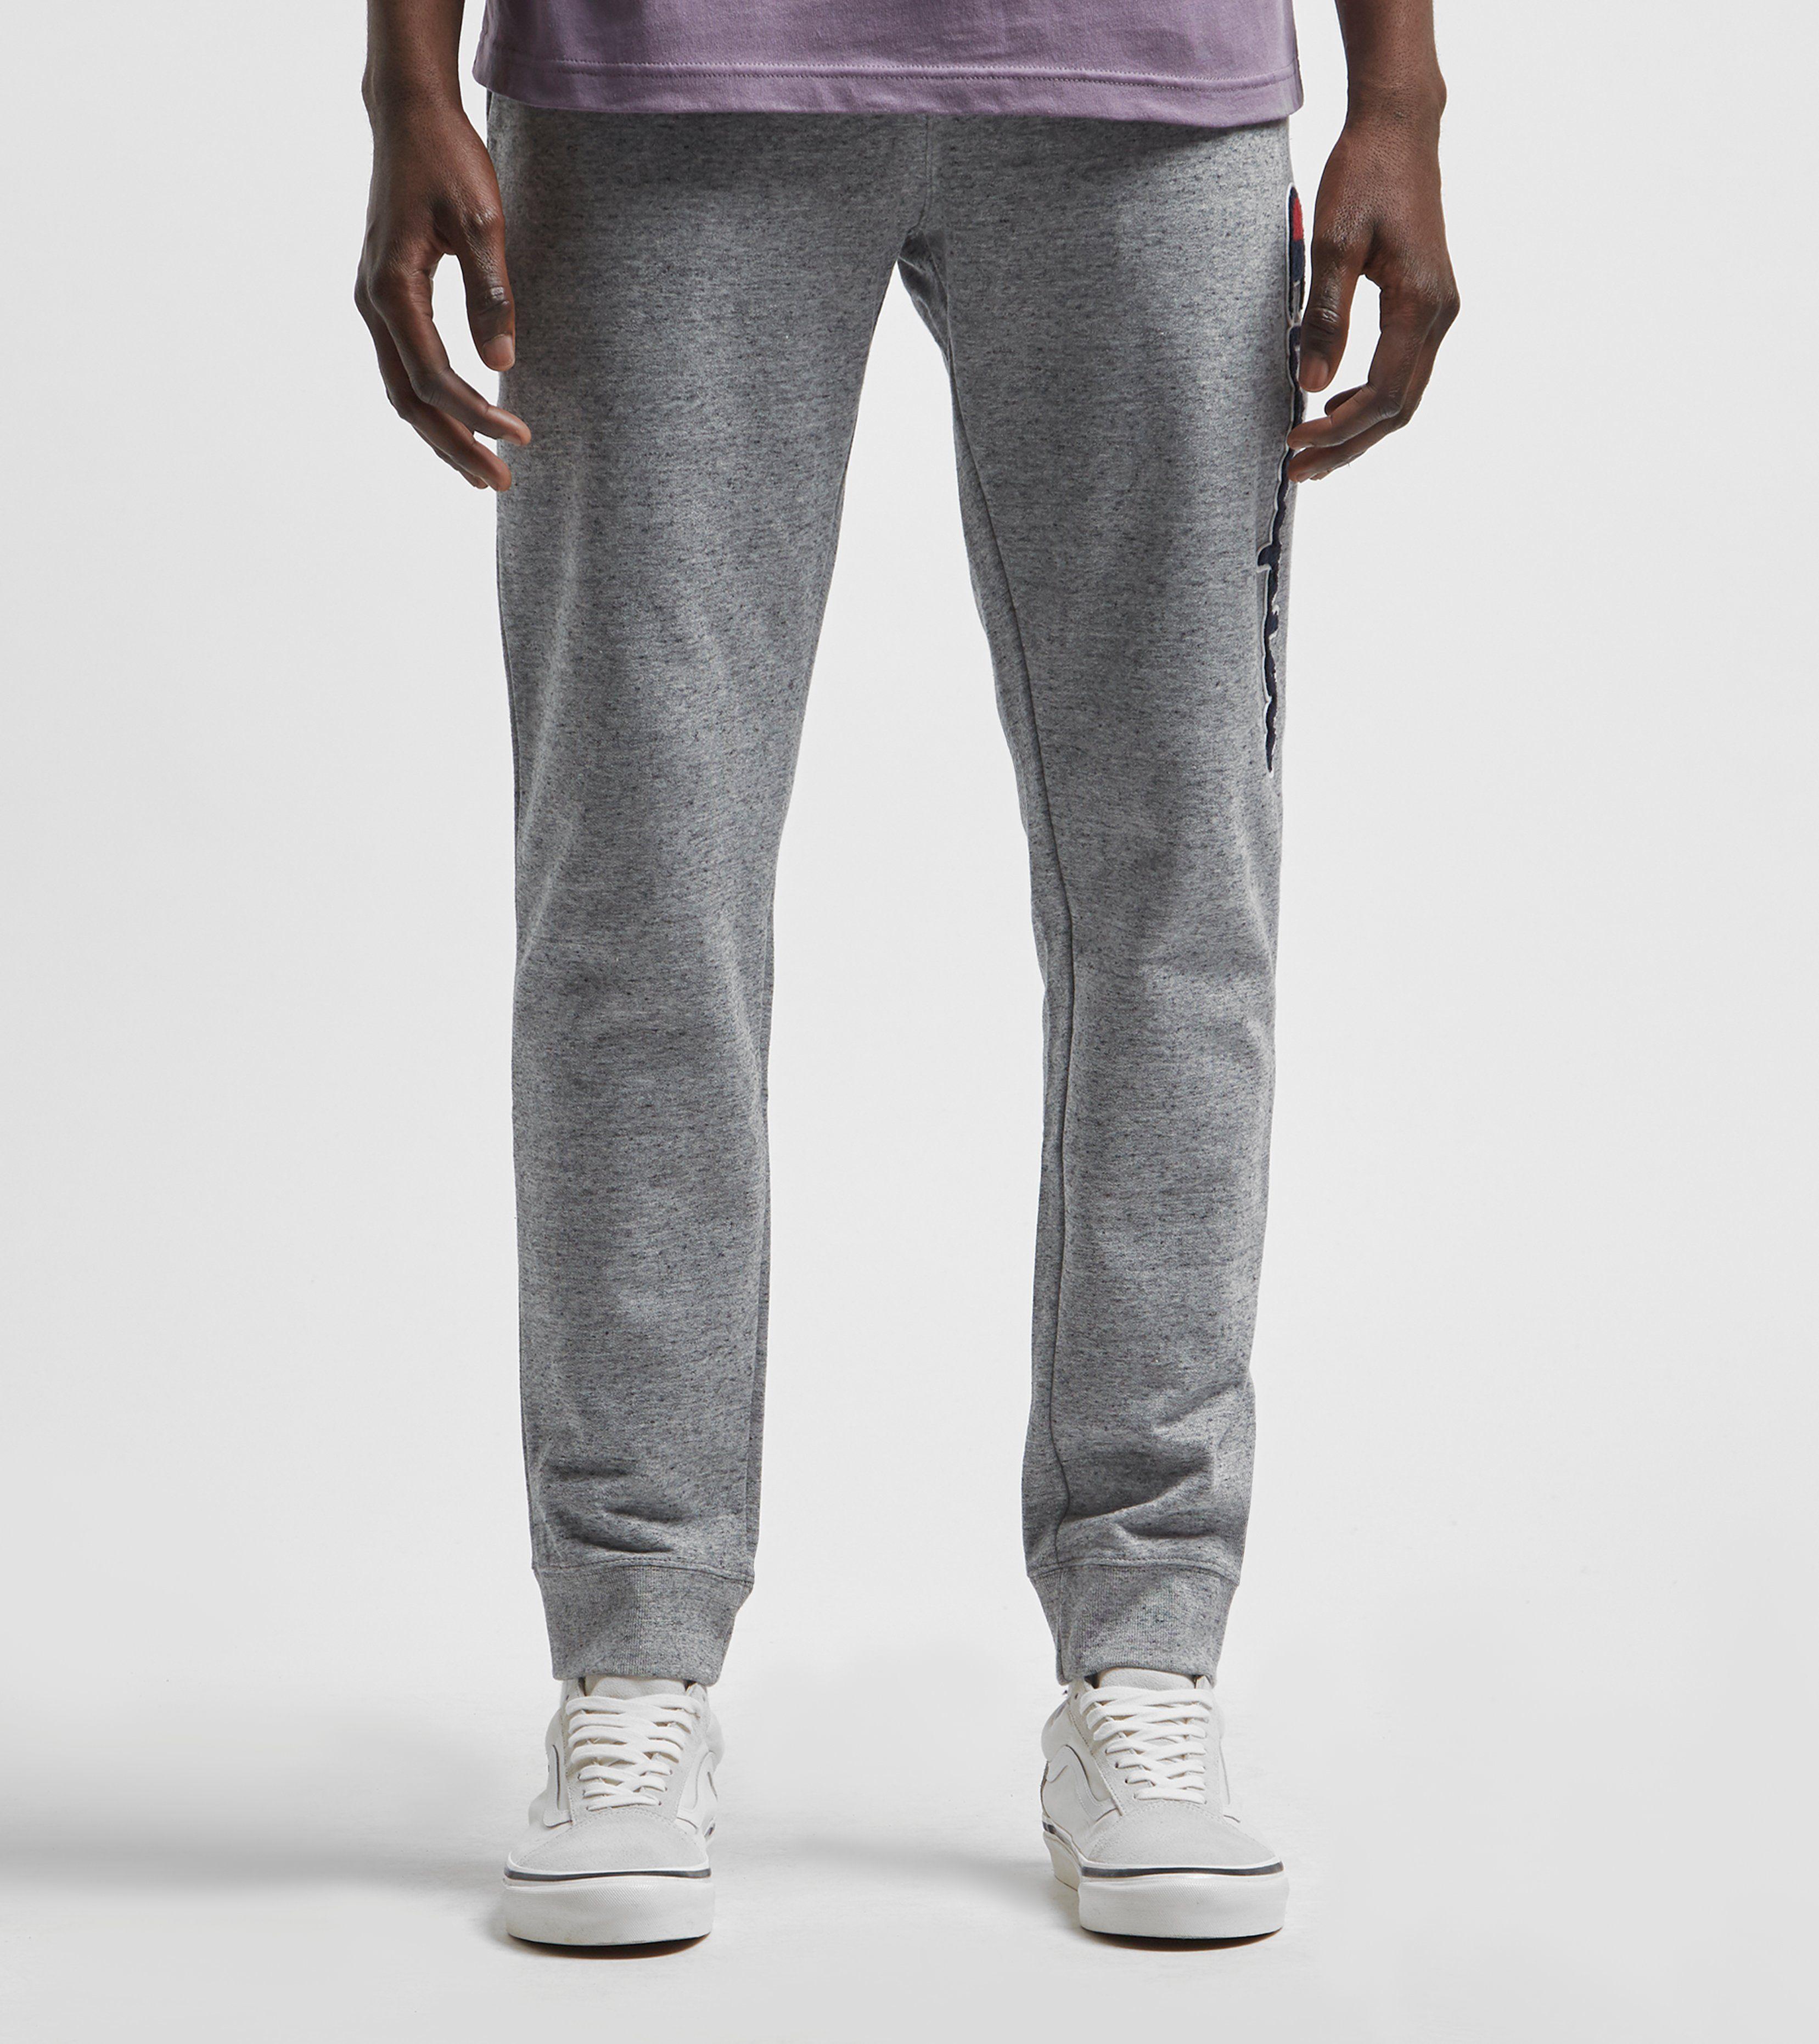 be027dc8986f Champion Reverse Weave Cuffed Fleece Pants